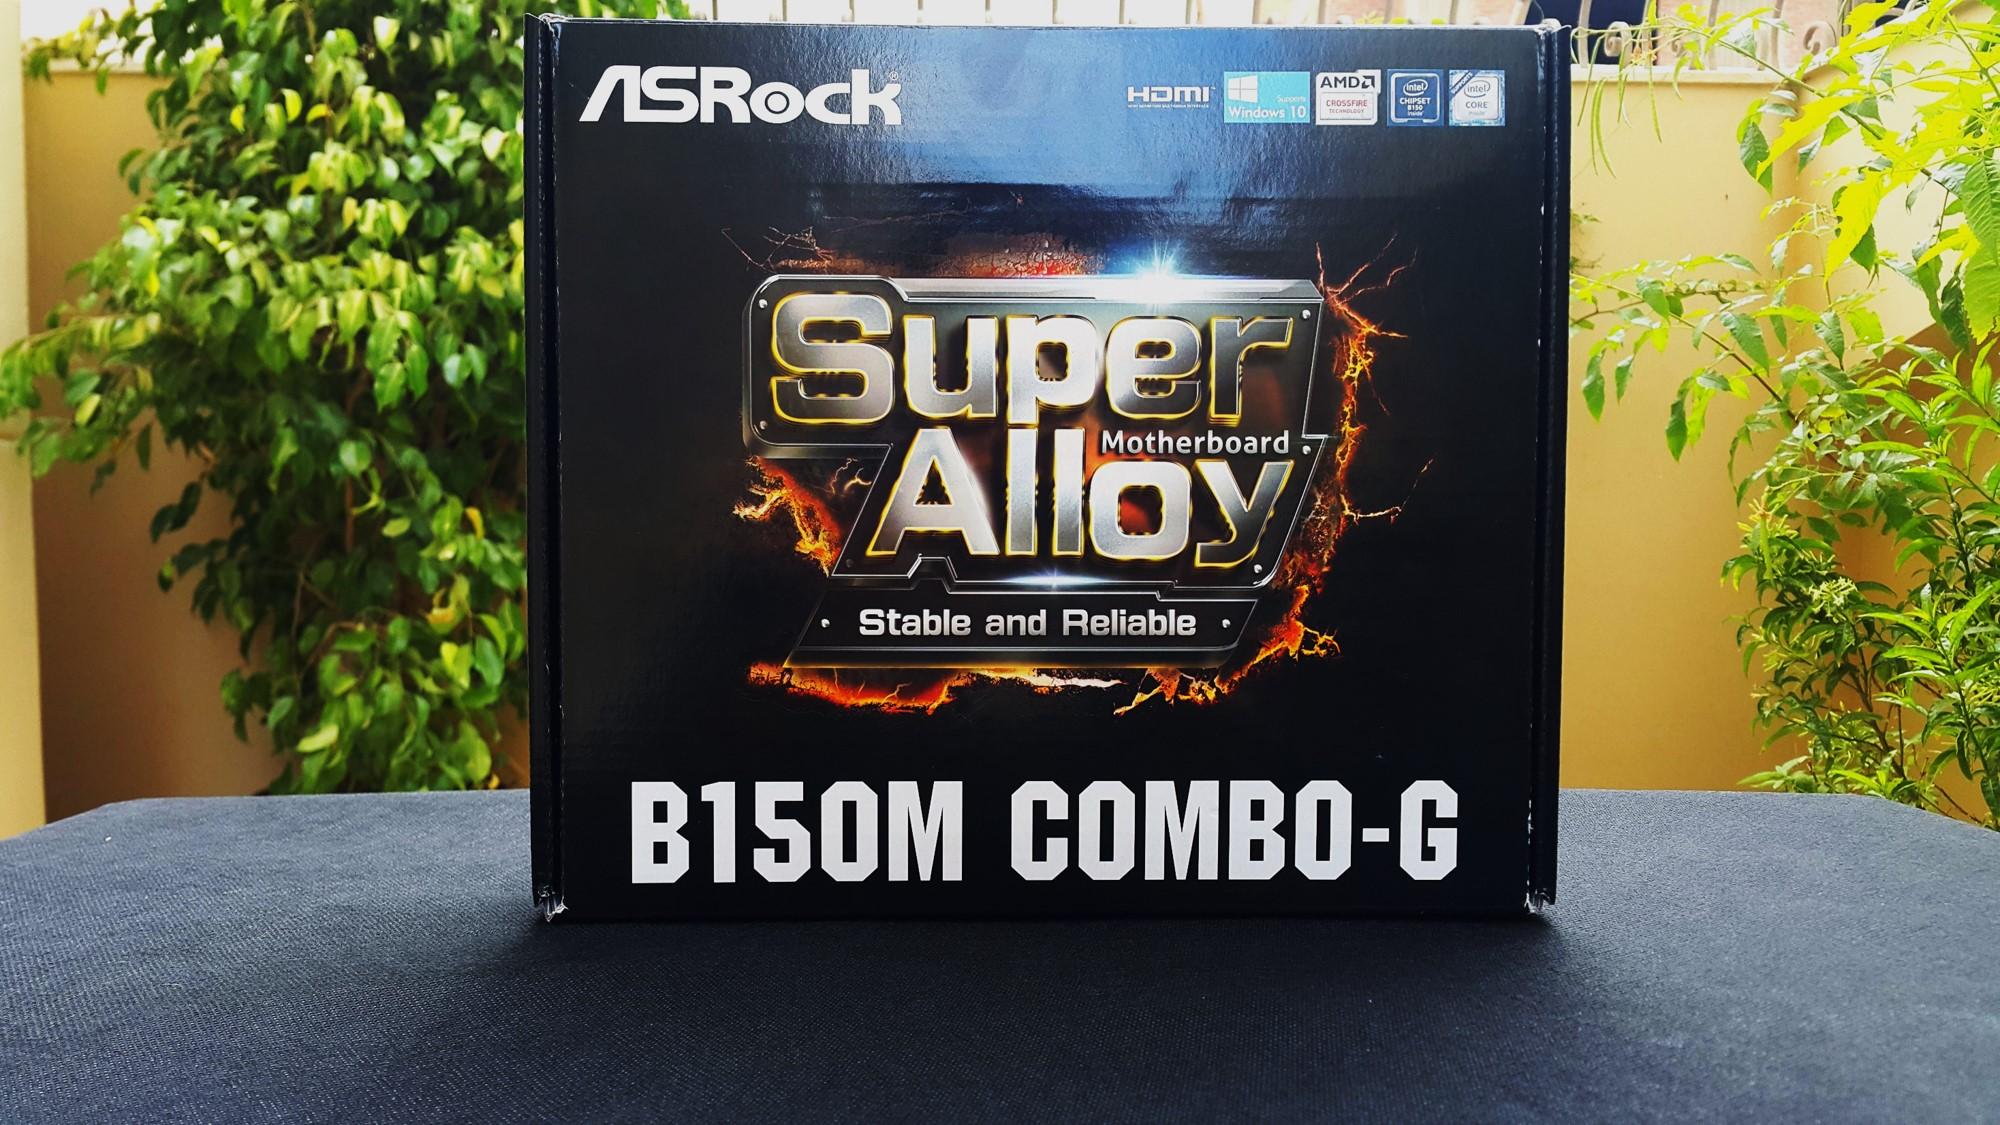 Asrock B150M Combo G Box Front